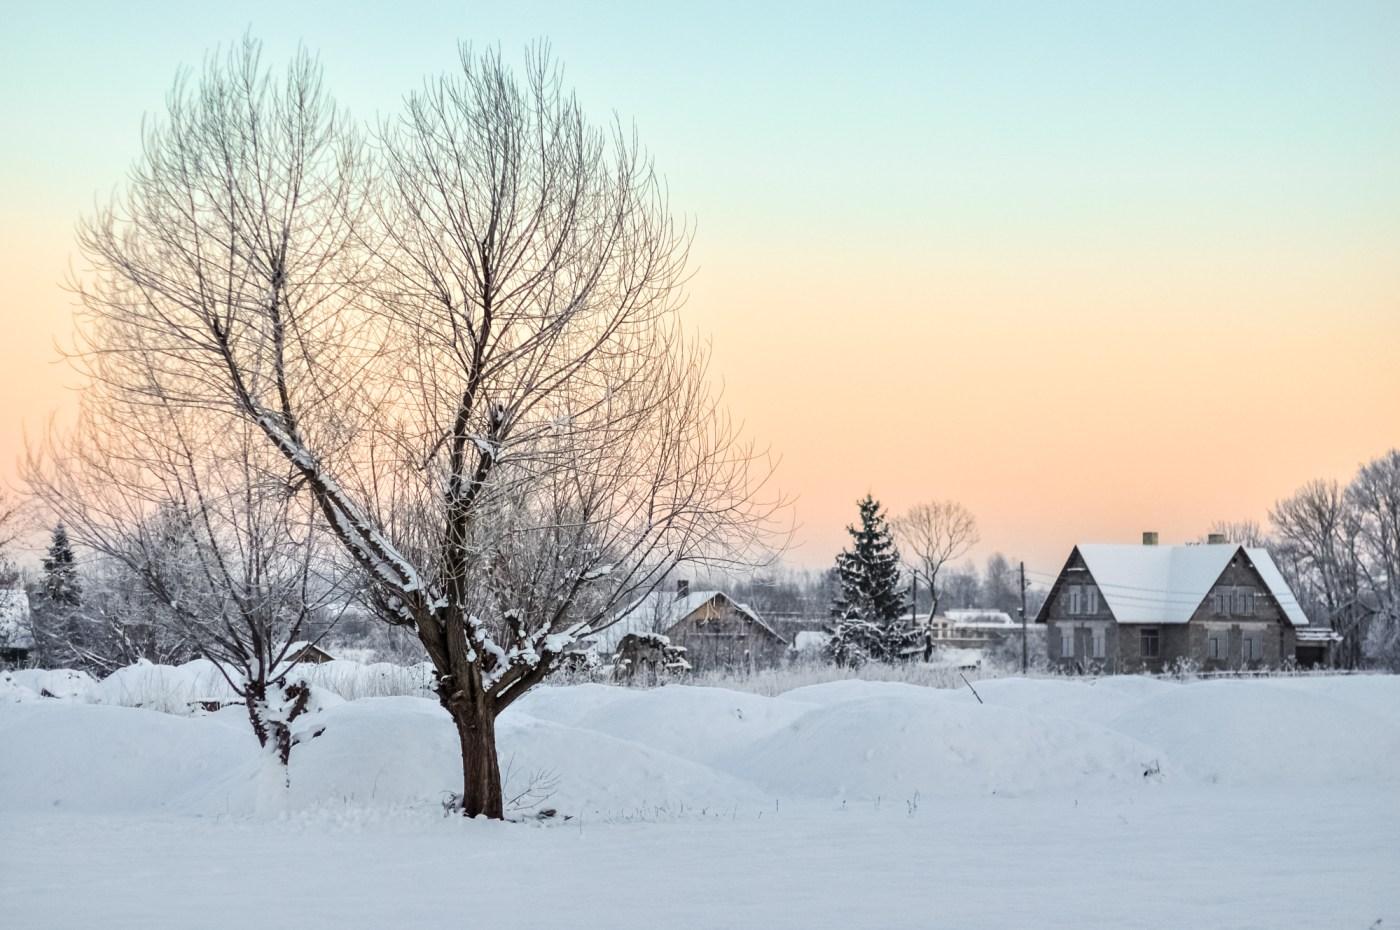 Postcards from Estonian winter!